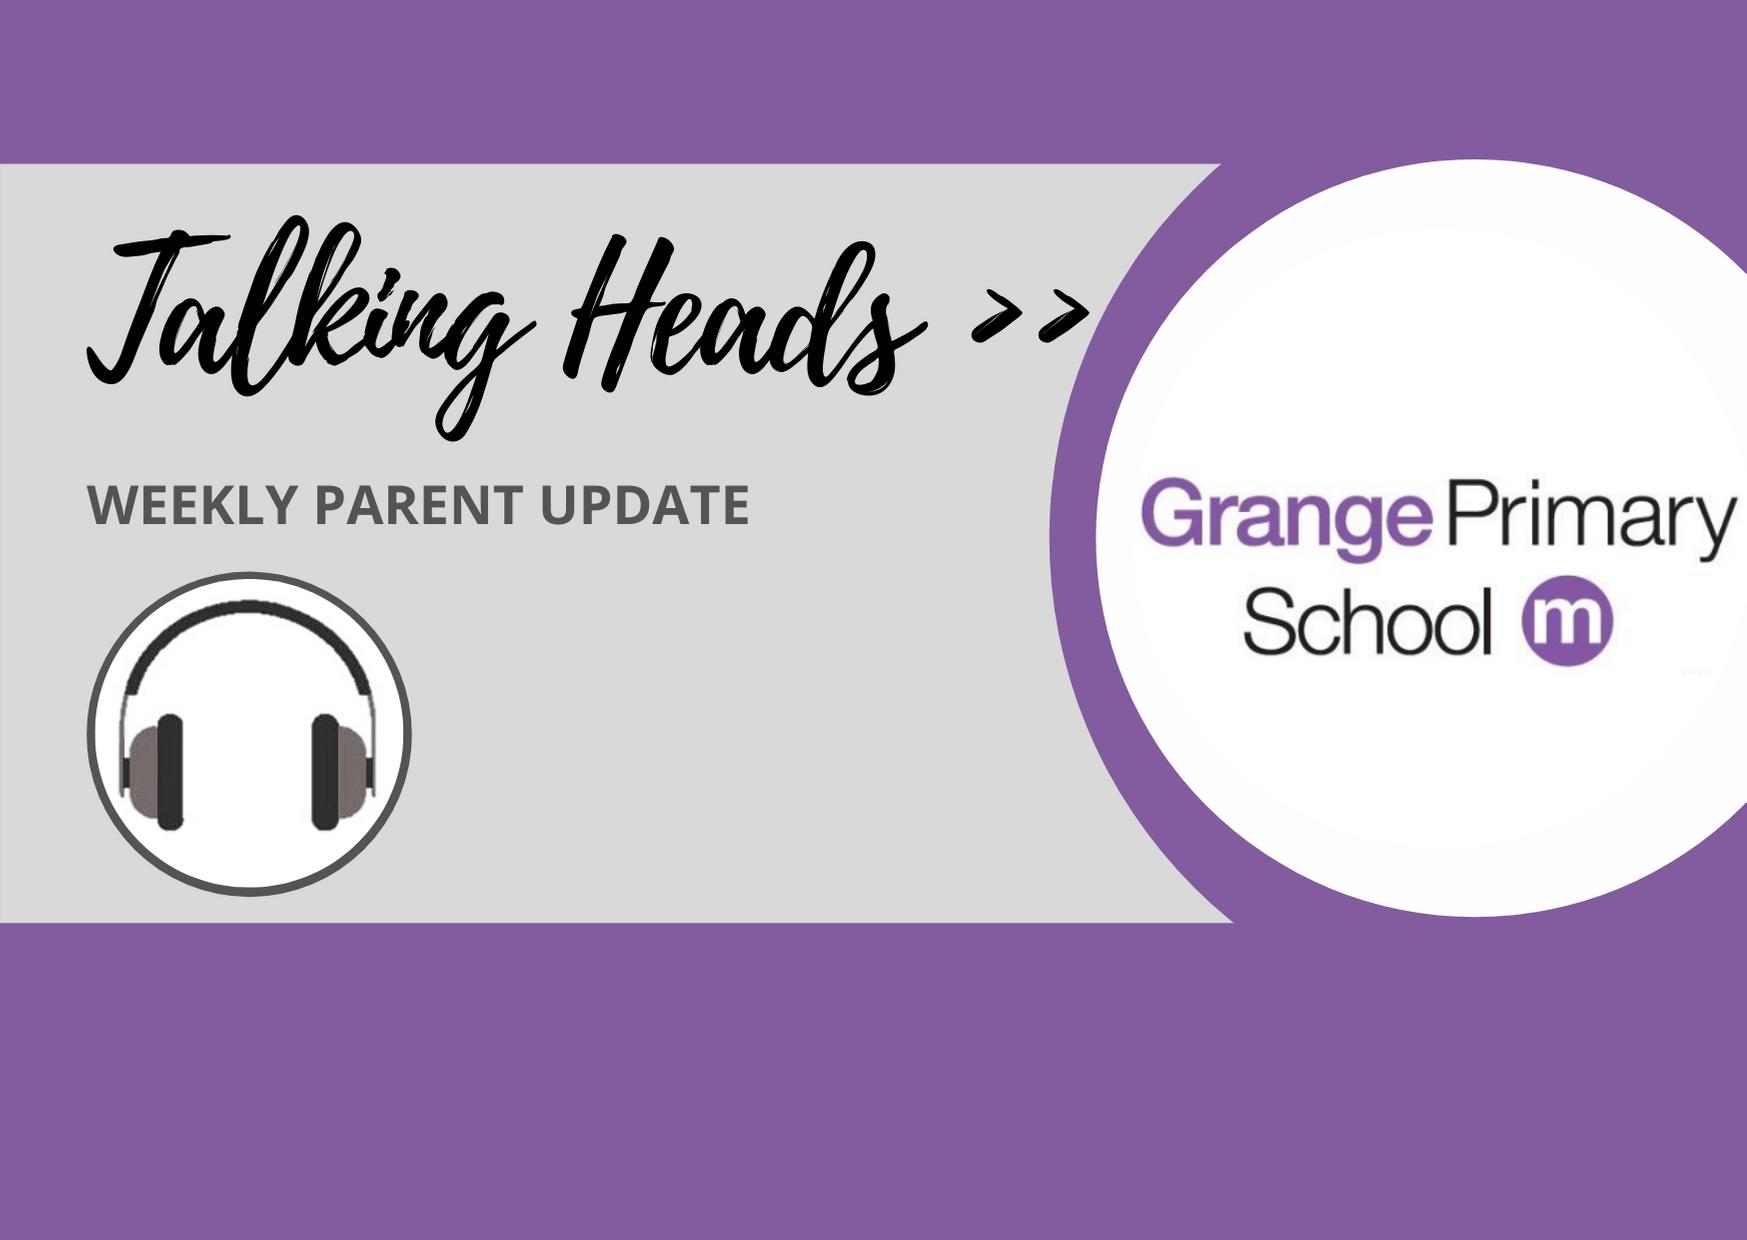 Talking Heads - Weekly Parent Update